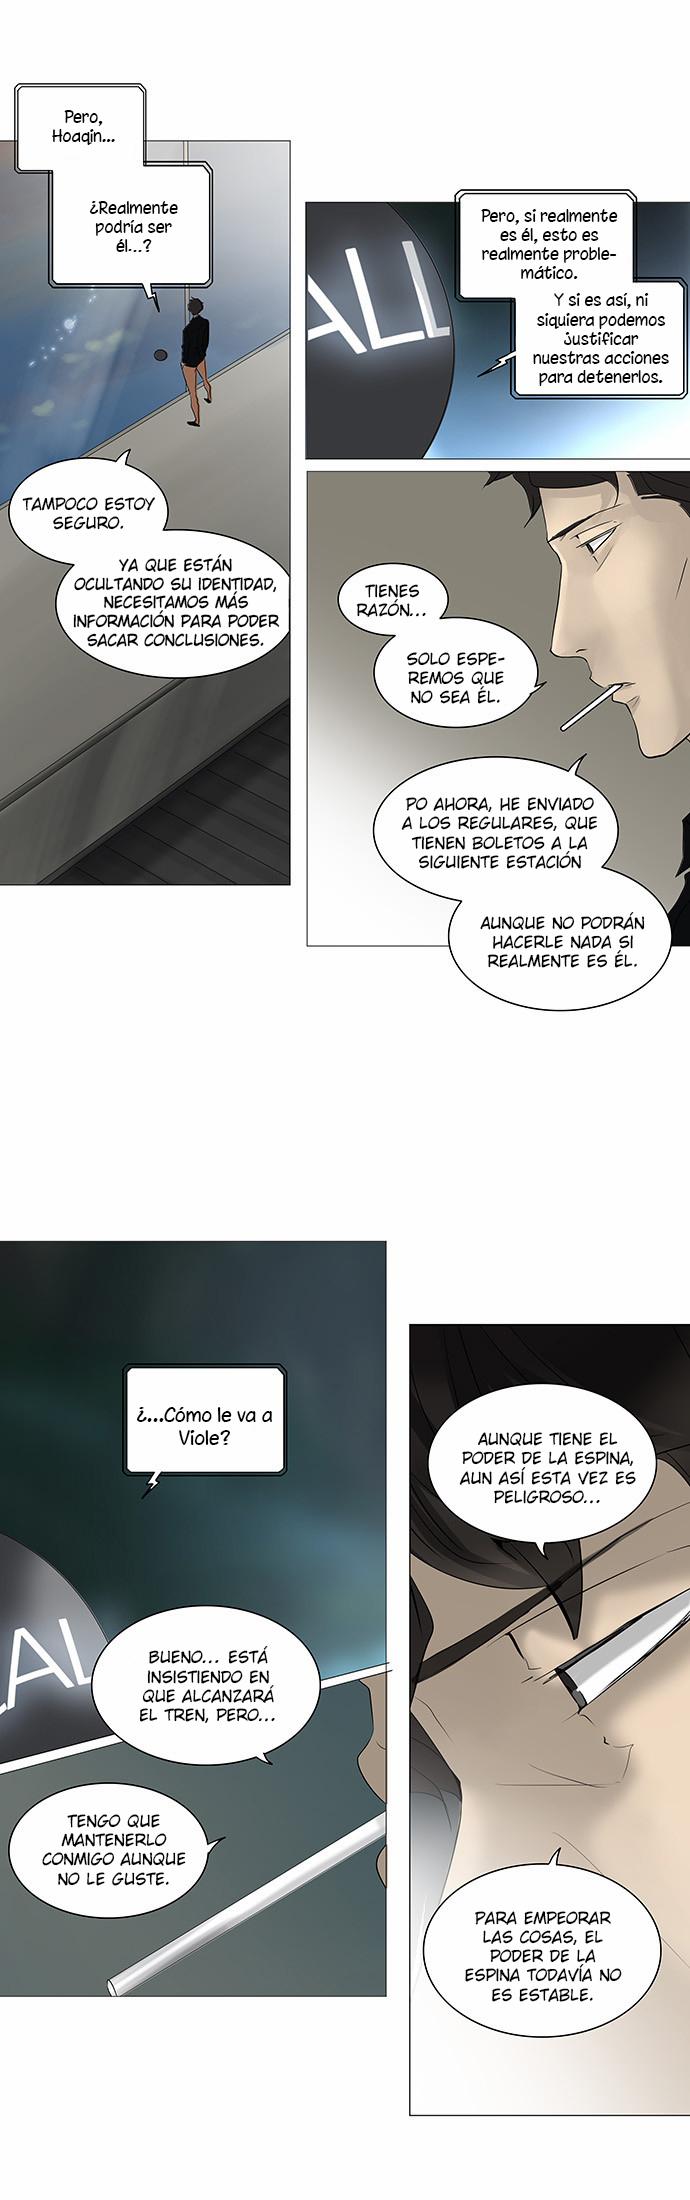 http://c5.ninemanga.com/es_manga/21/149/389213/b53cbe6da81db747a73e52a5a48d2703.jpg Page 7